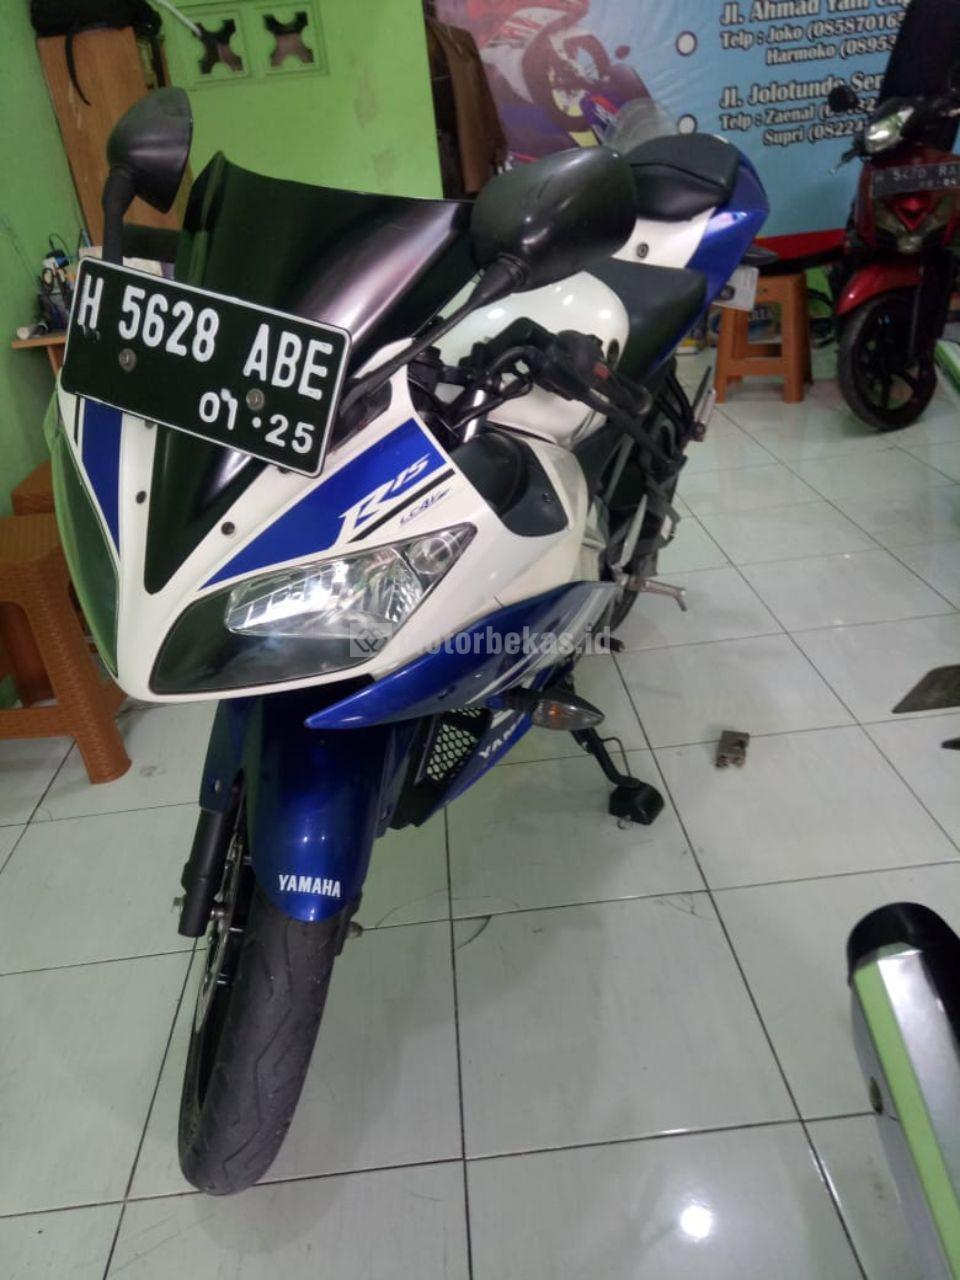 YAMAHA R15  1232 motorbekas.id